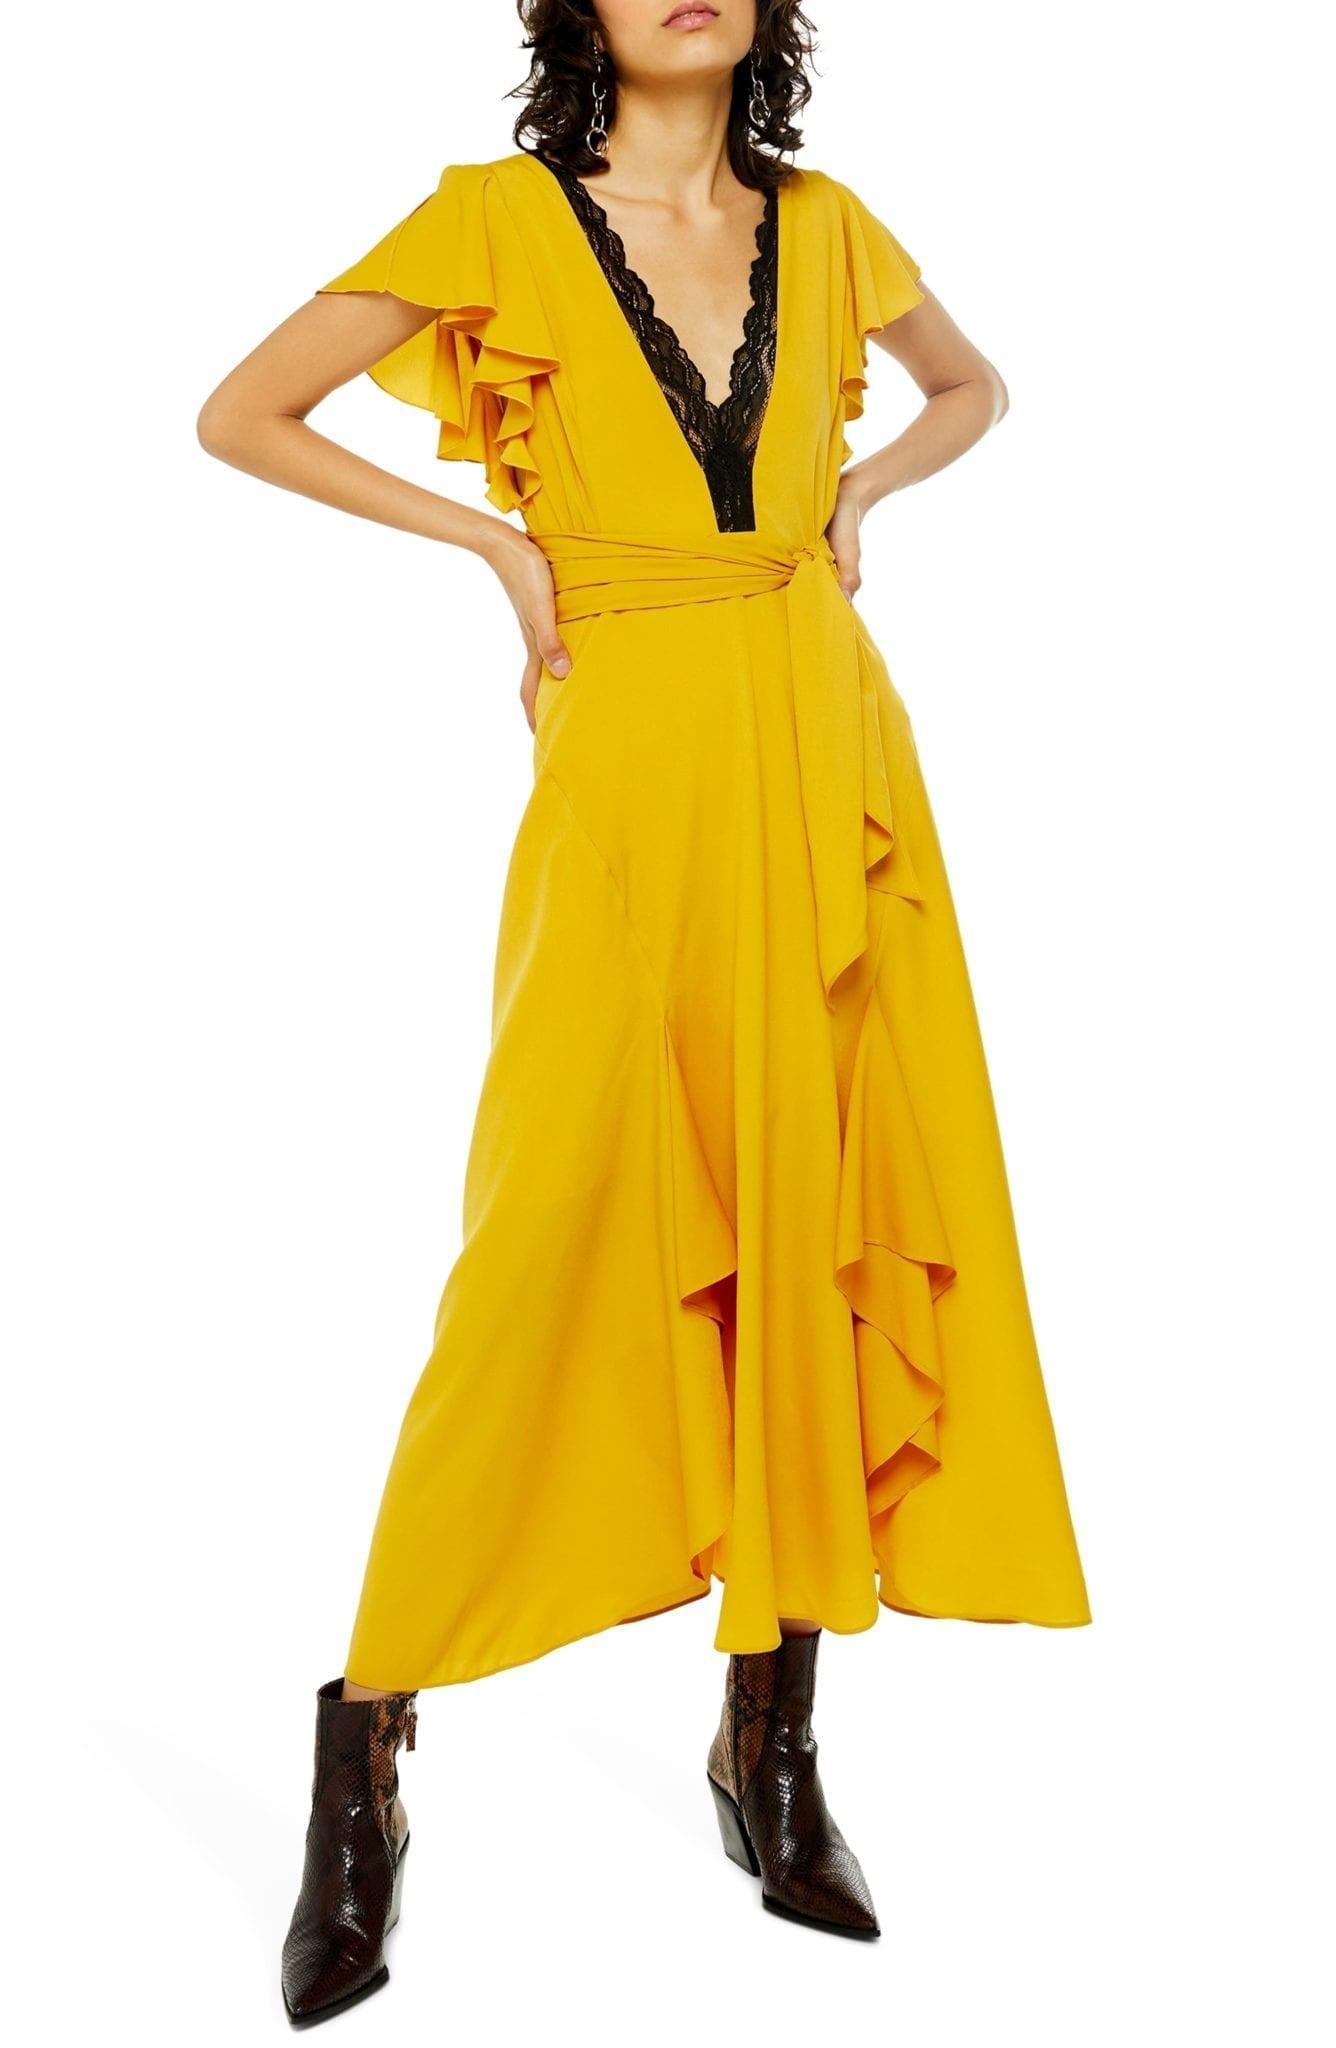 TOPSHOP Lace Inset Midi Dress